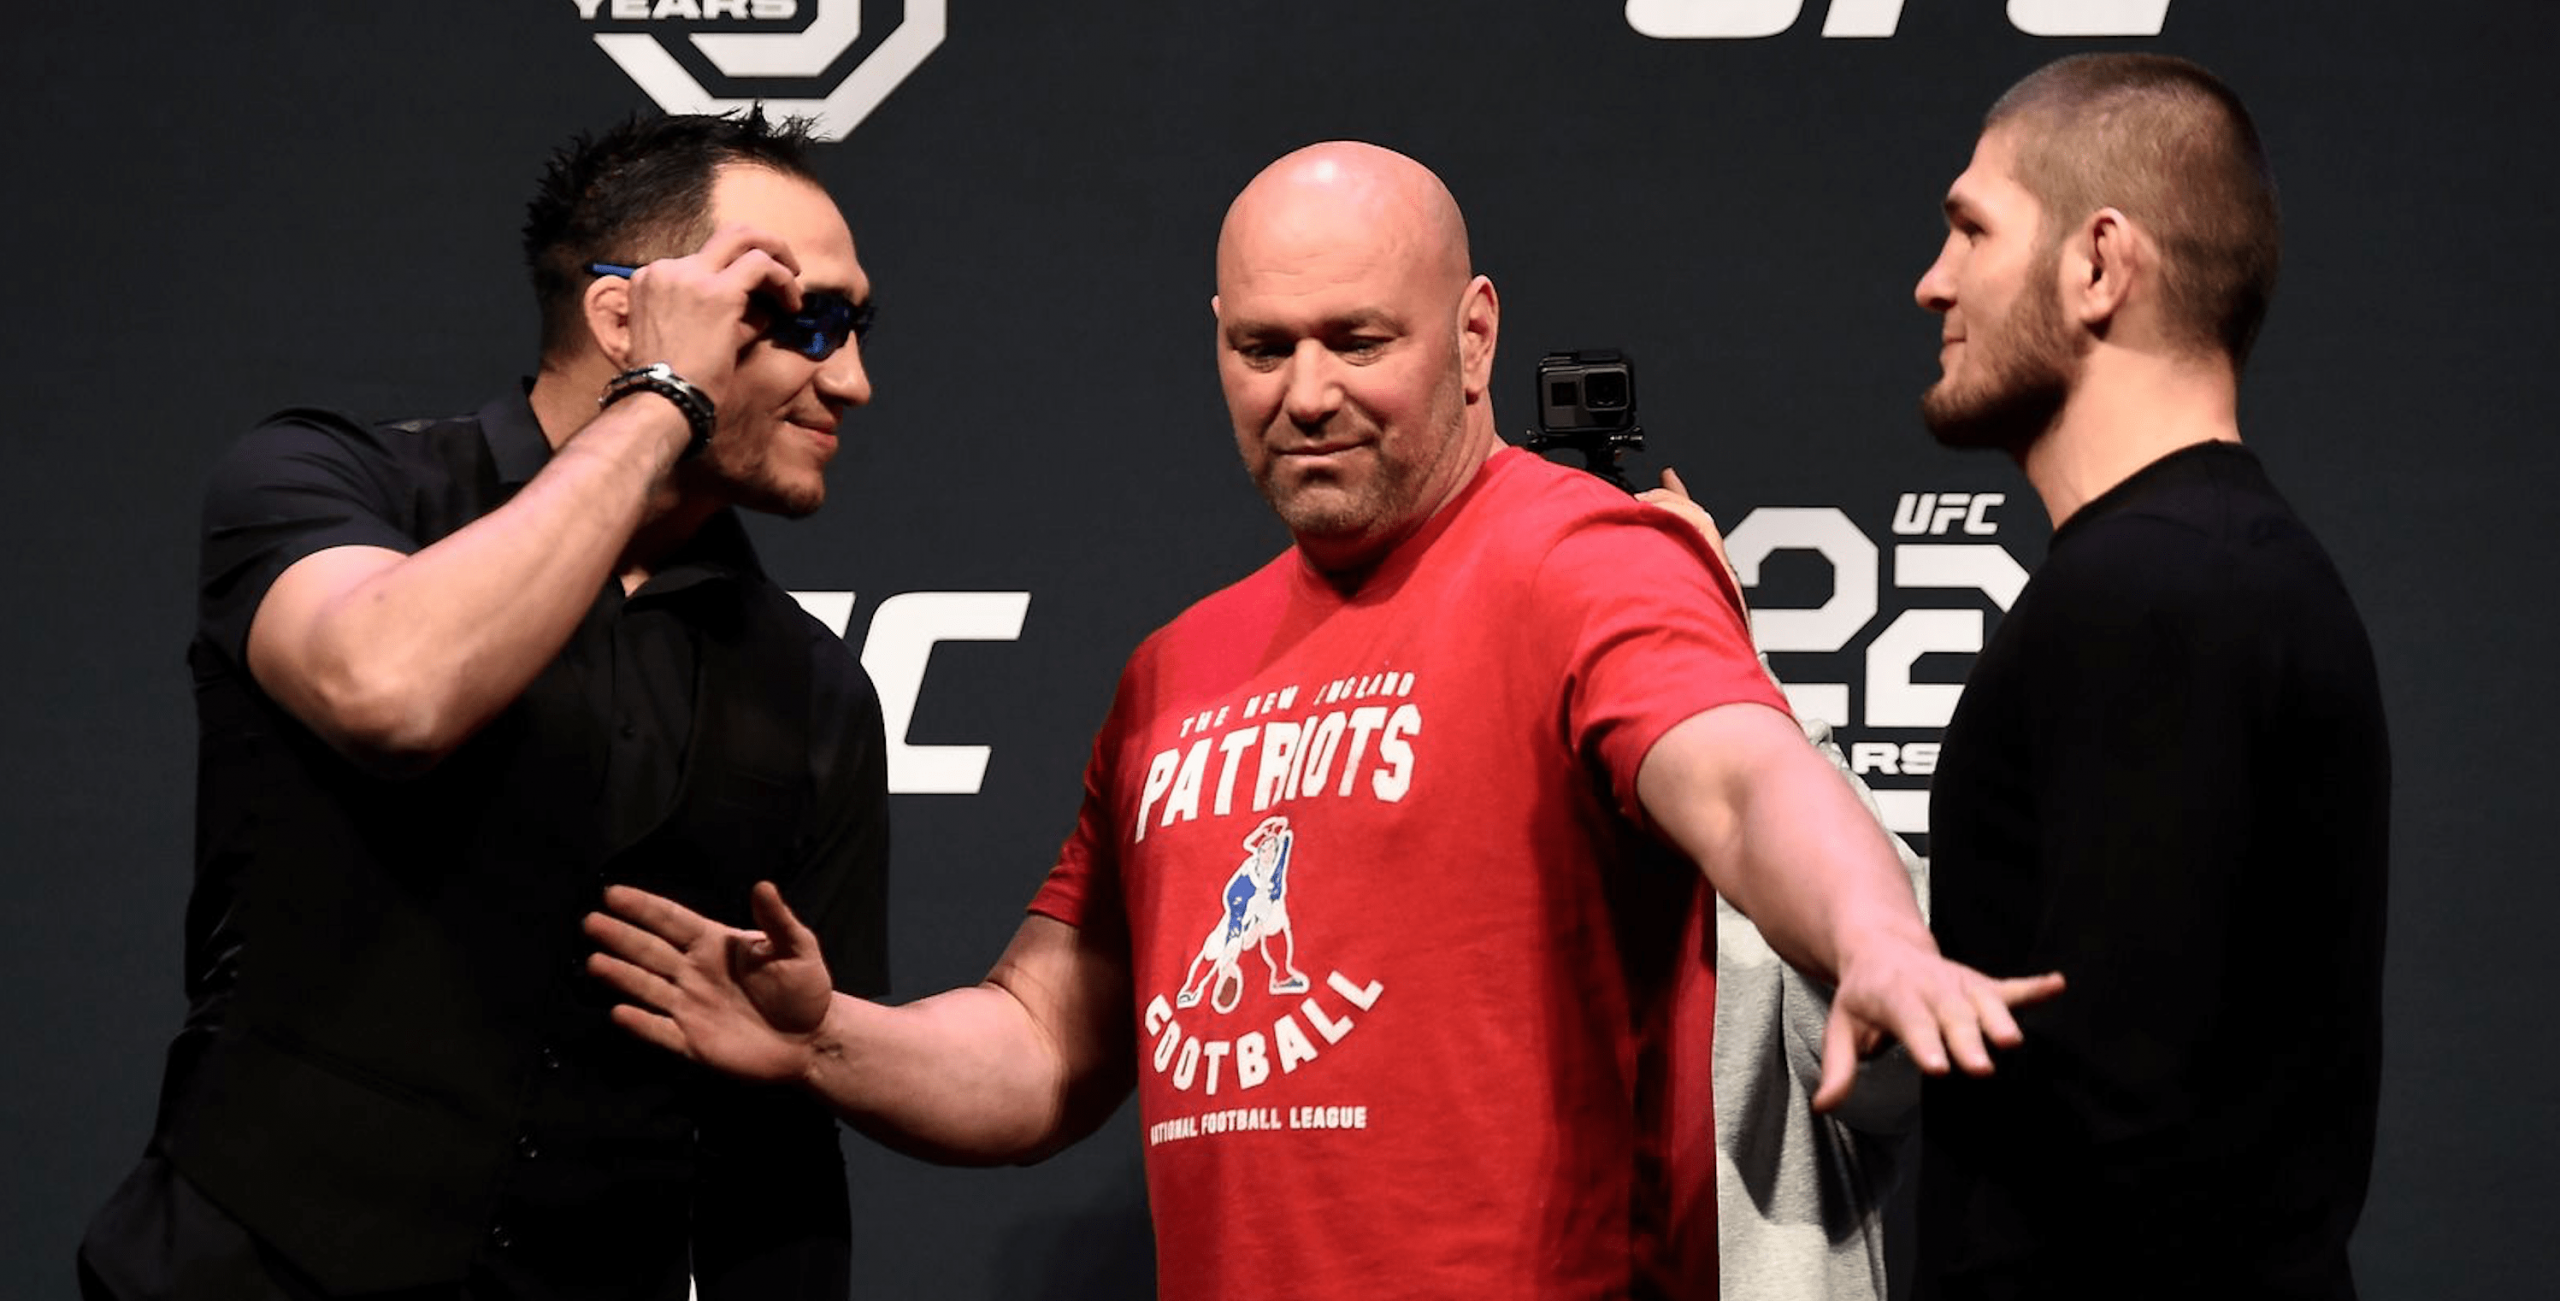 UFC: Tony Ferguson Signs Contract To Fight Khabib